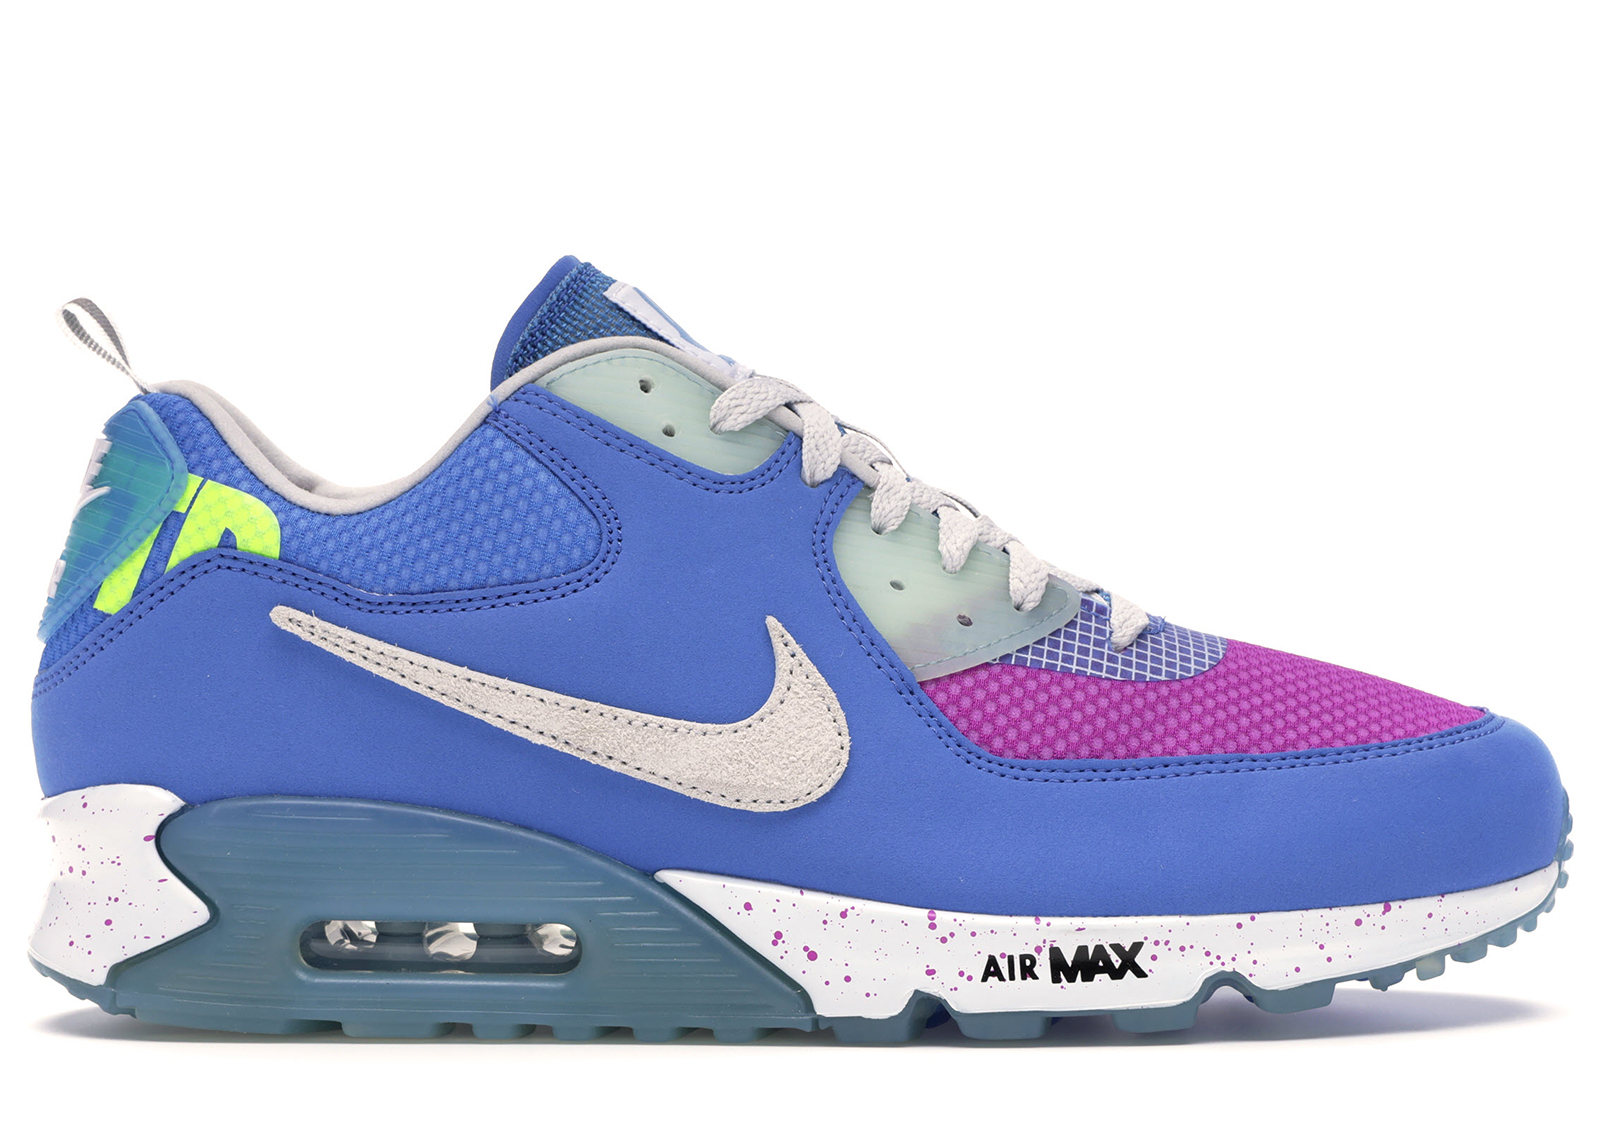 nike air max in blue